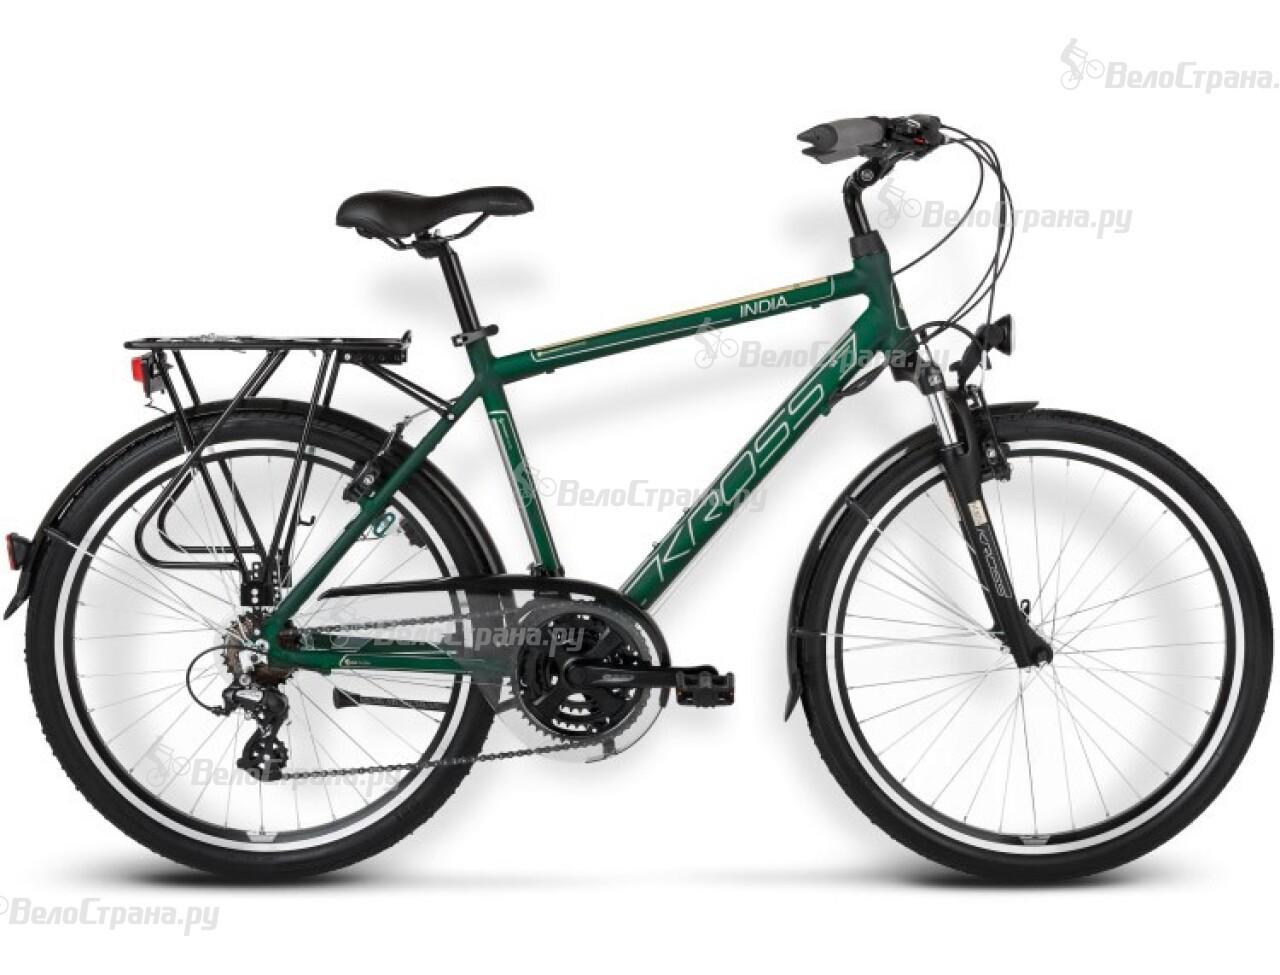 Велосипед Kross Trans India (2015) велосипед kross trans sander 2015